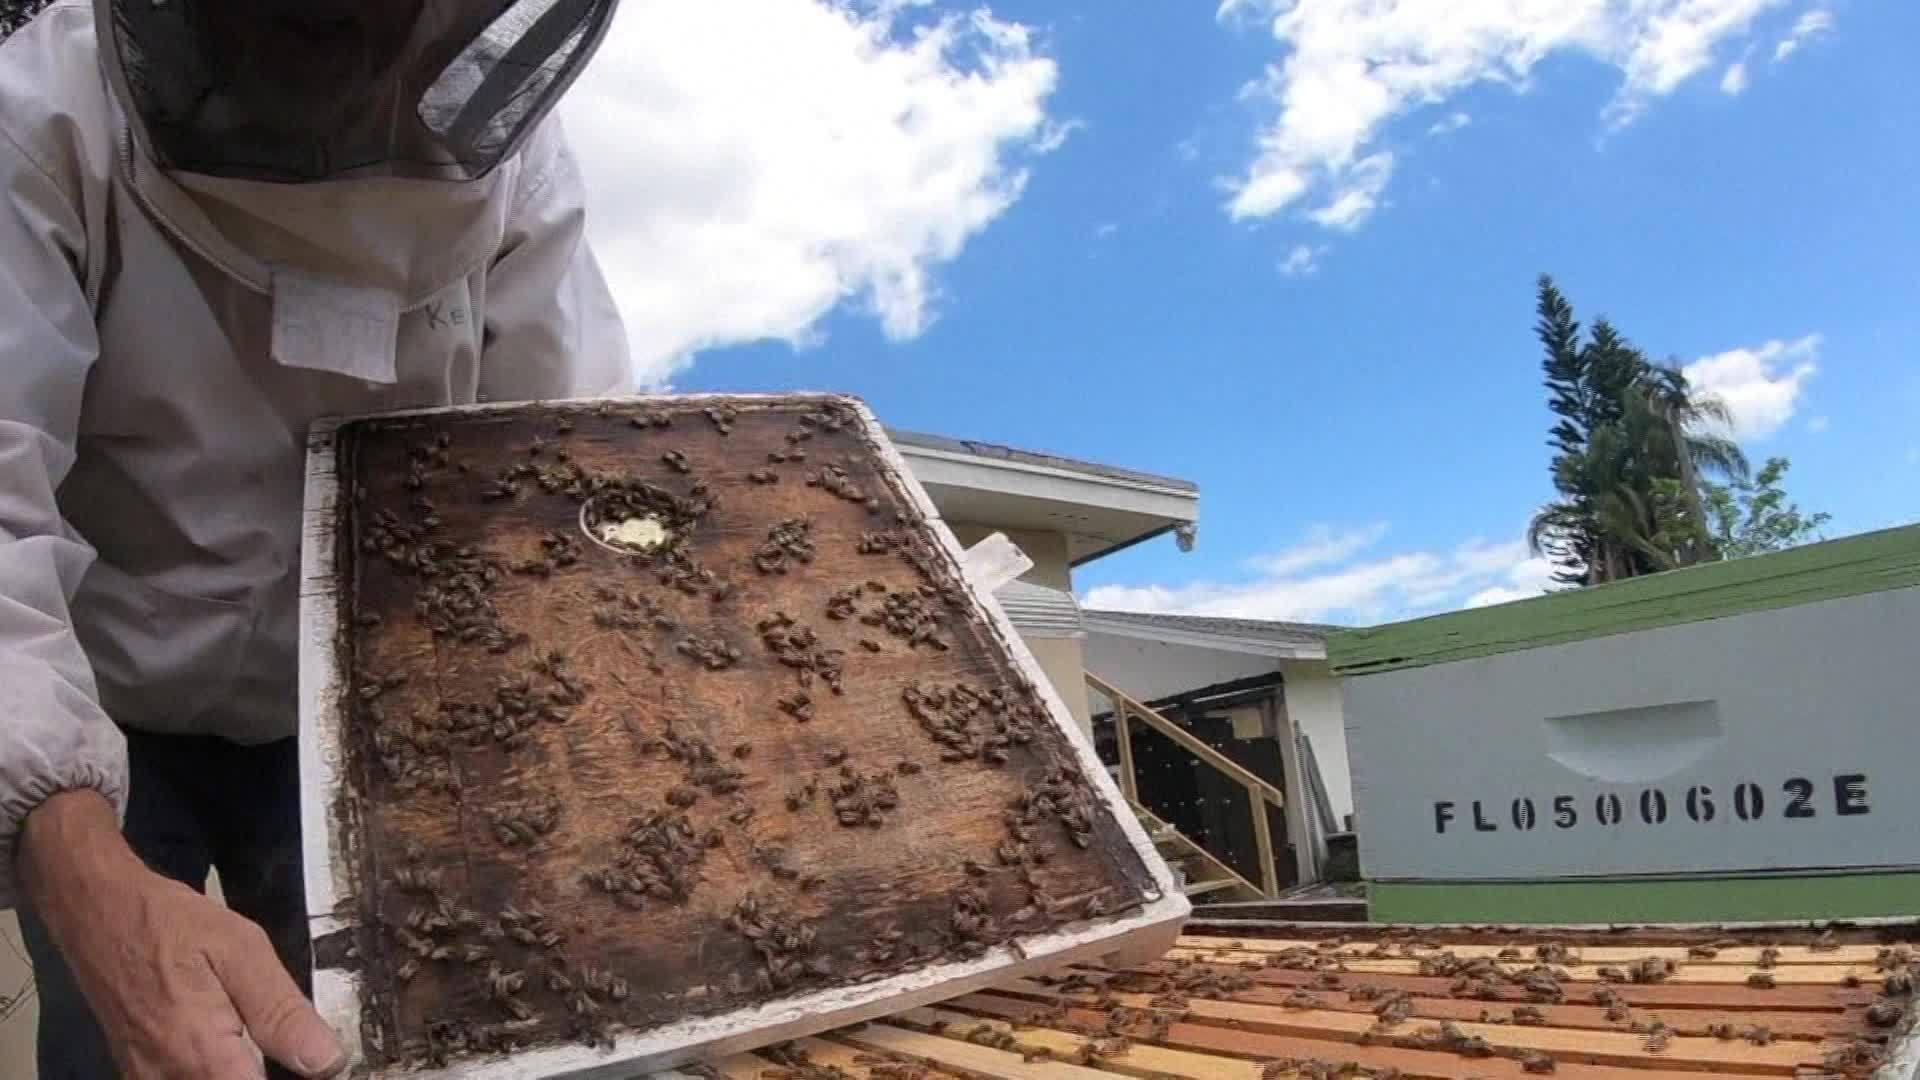 Florida honey bee population